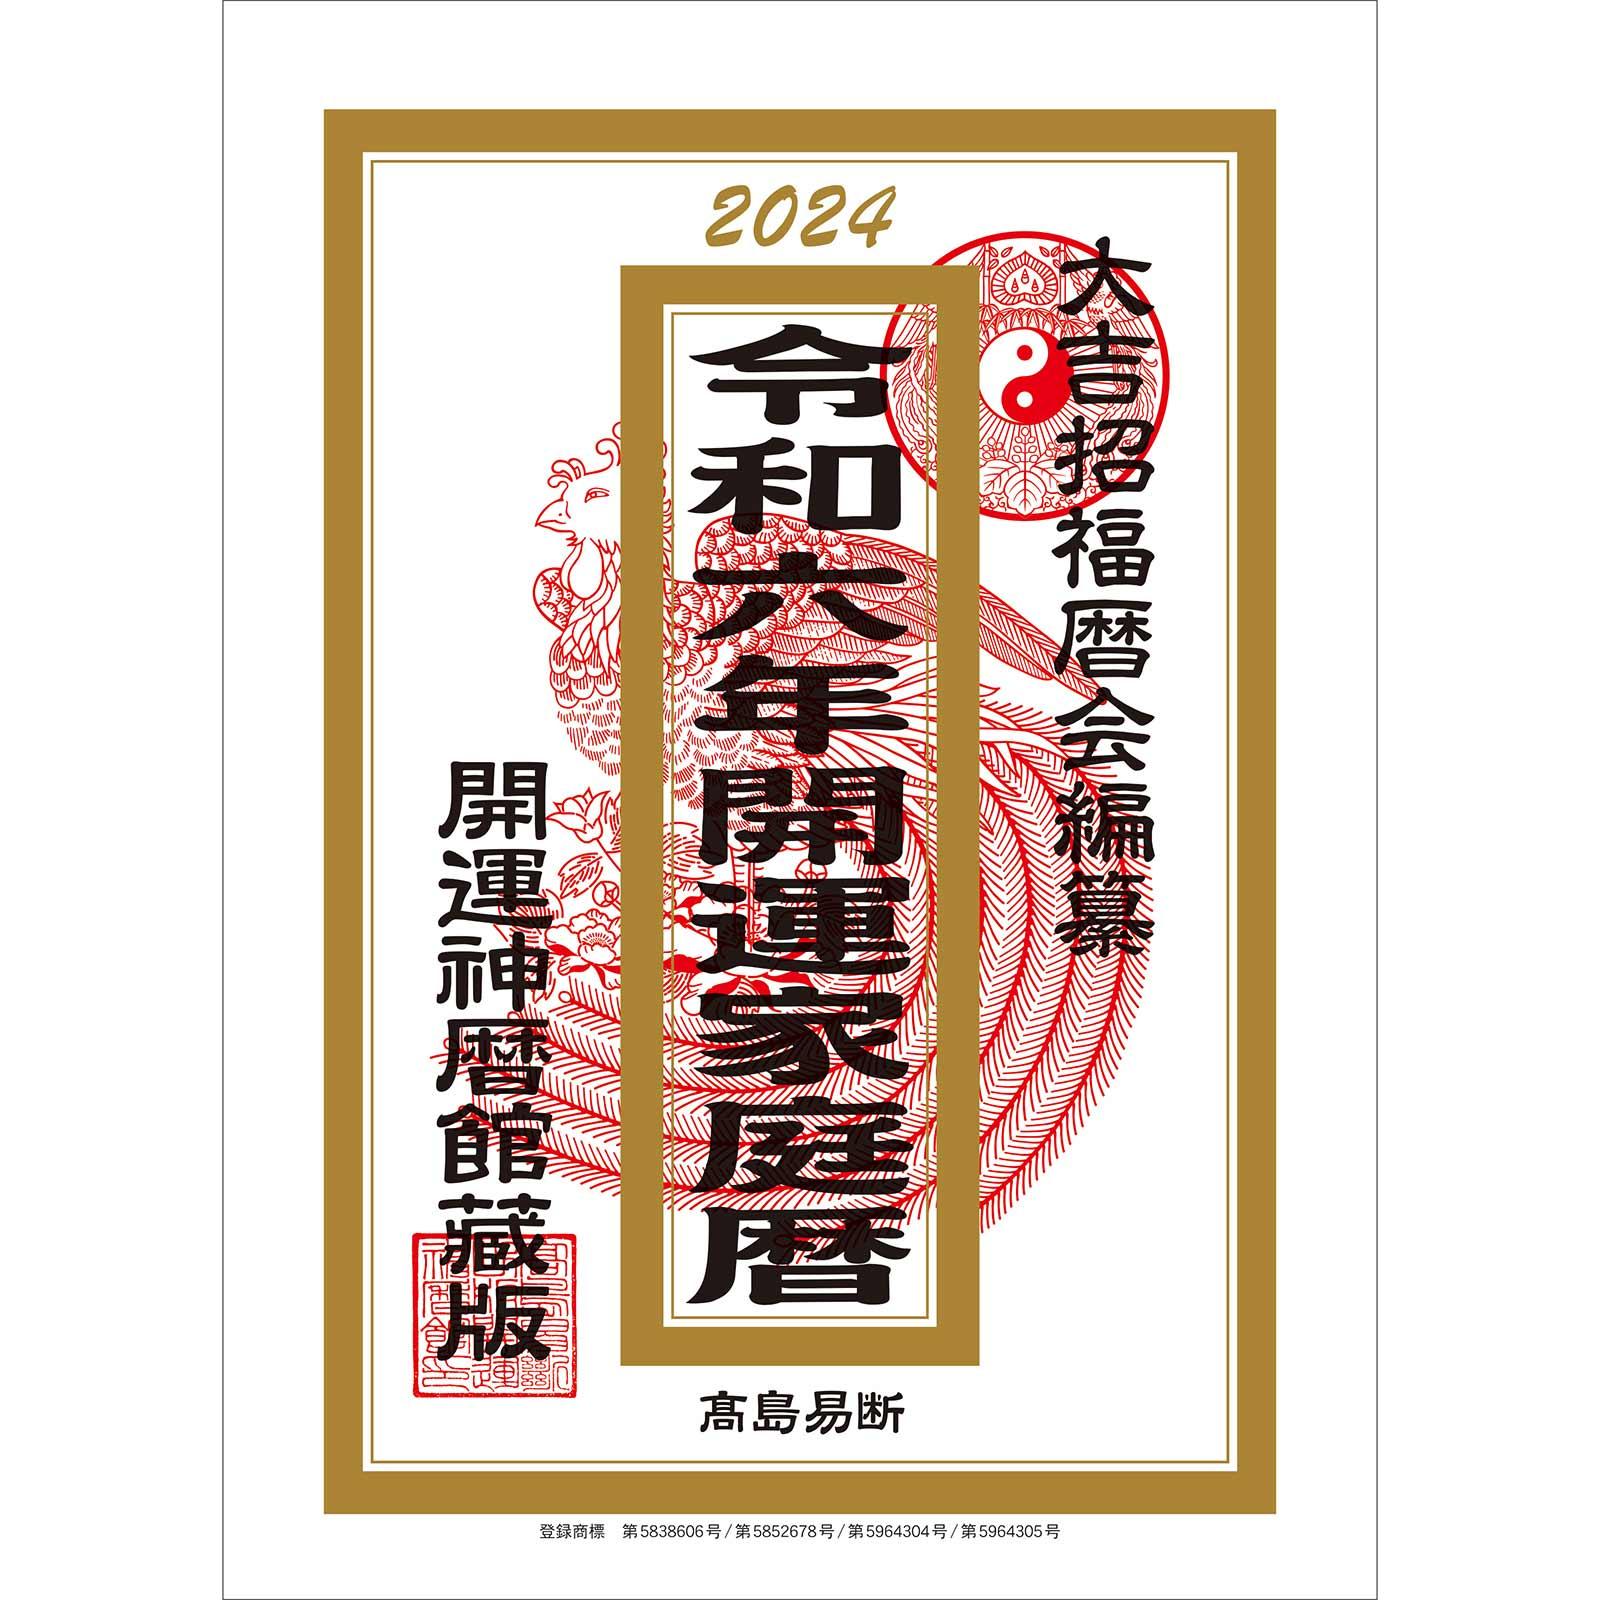 TD-10020(2022年版)<br>開運家庭暦<br>【クリックポスト対応/代引き不可】